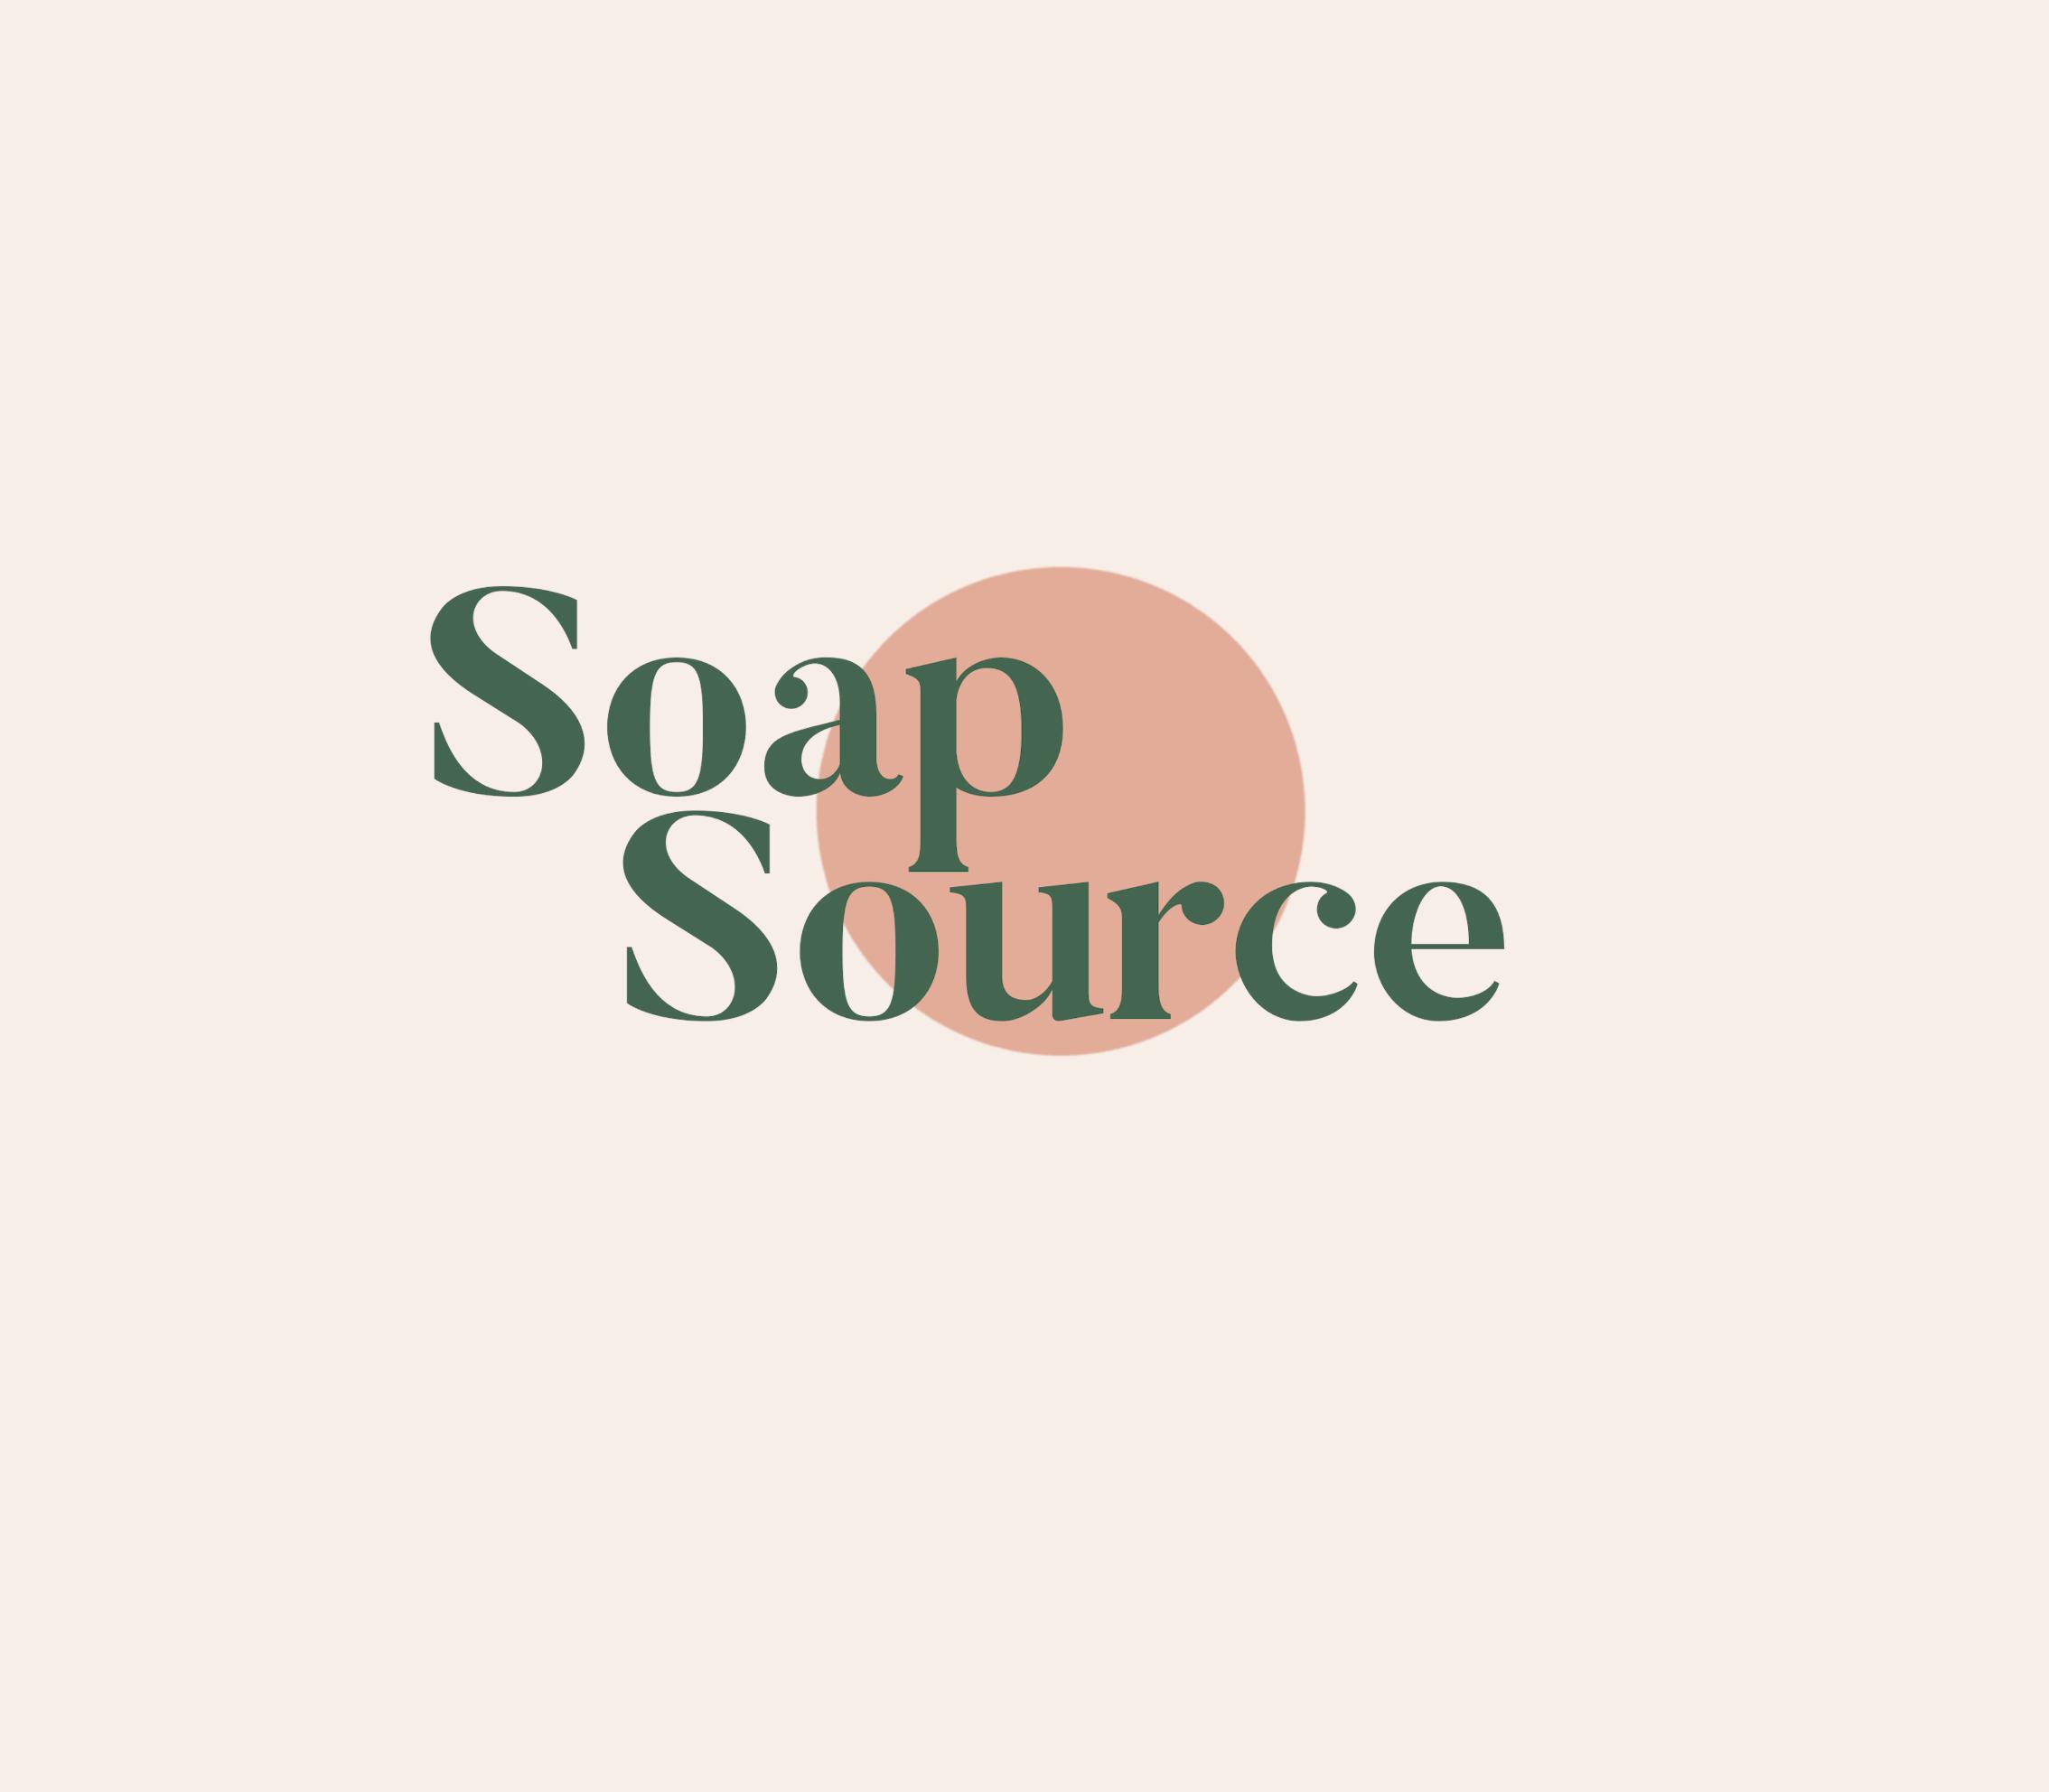 Soap Source